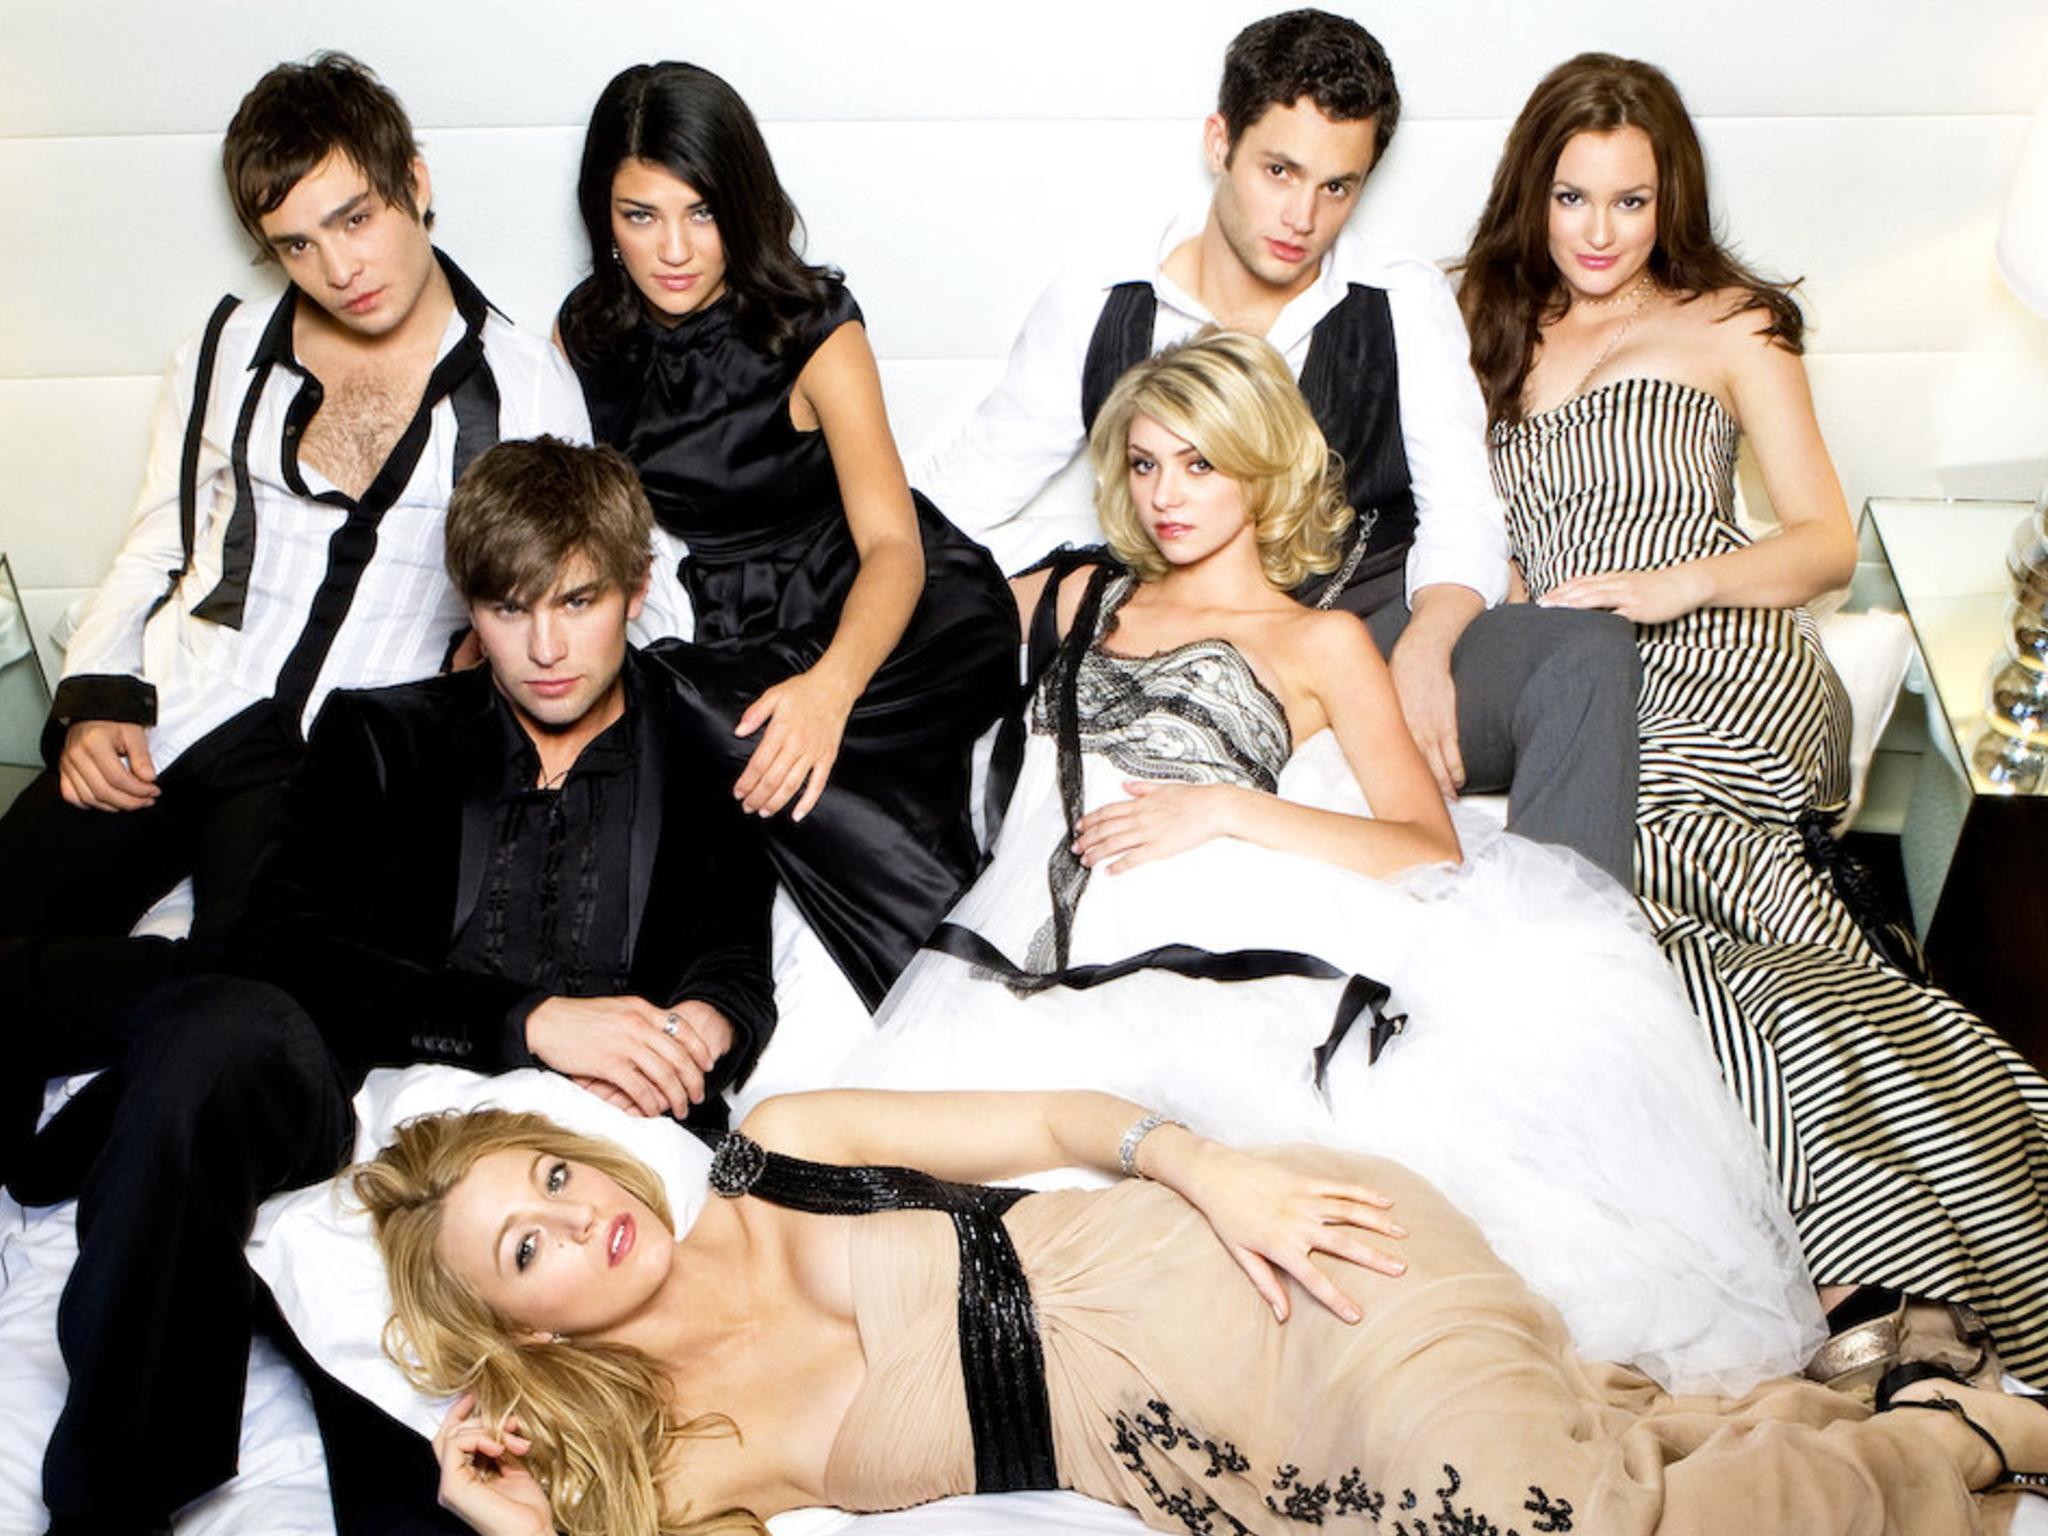 Gossip Girl cast shot including Blake Lively